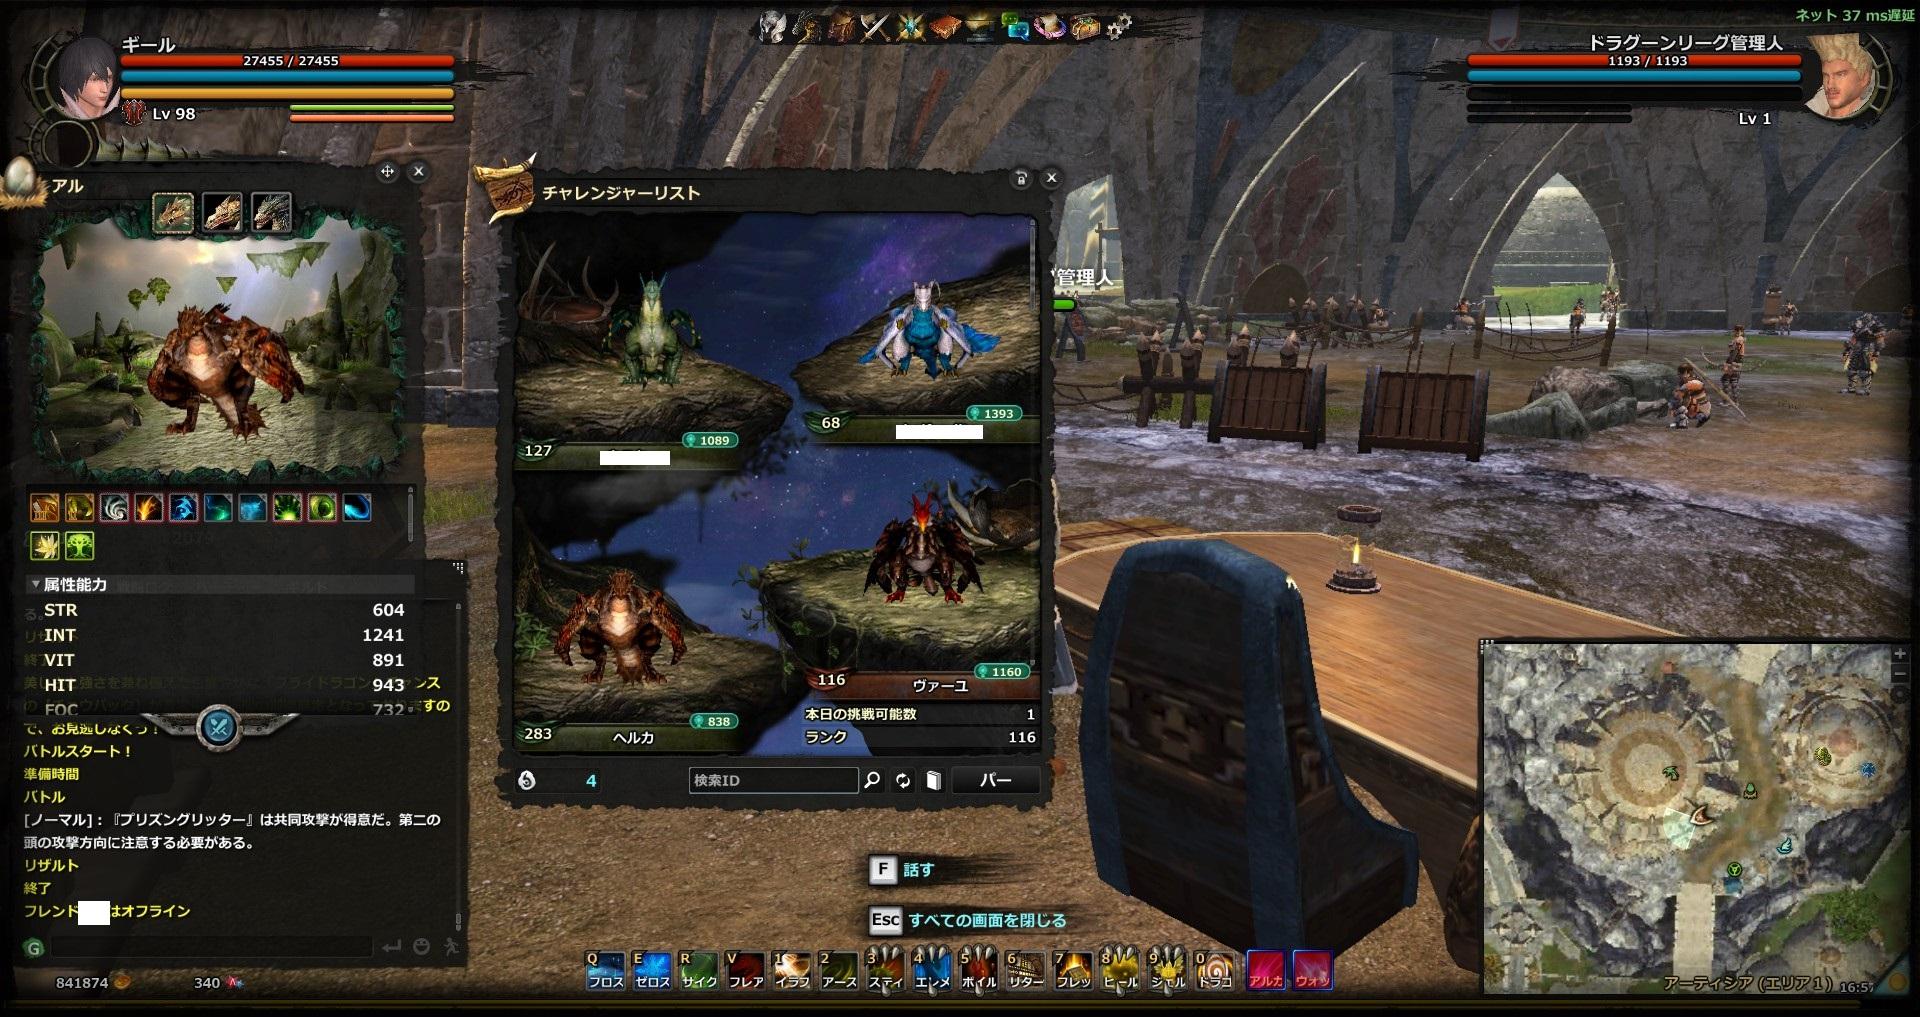 DragonsProphet_20140712_165723.jpg